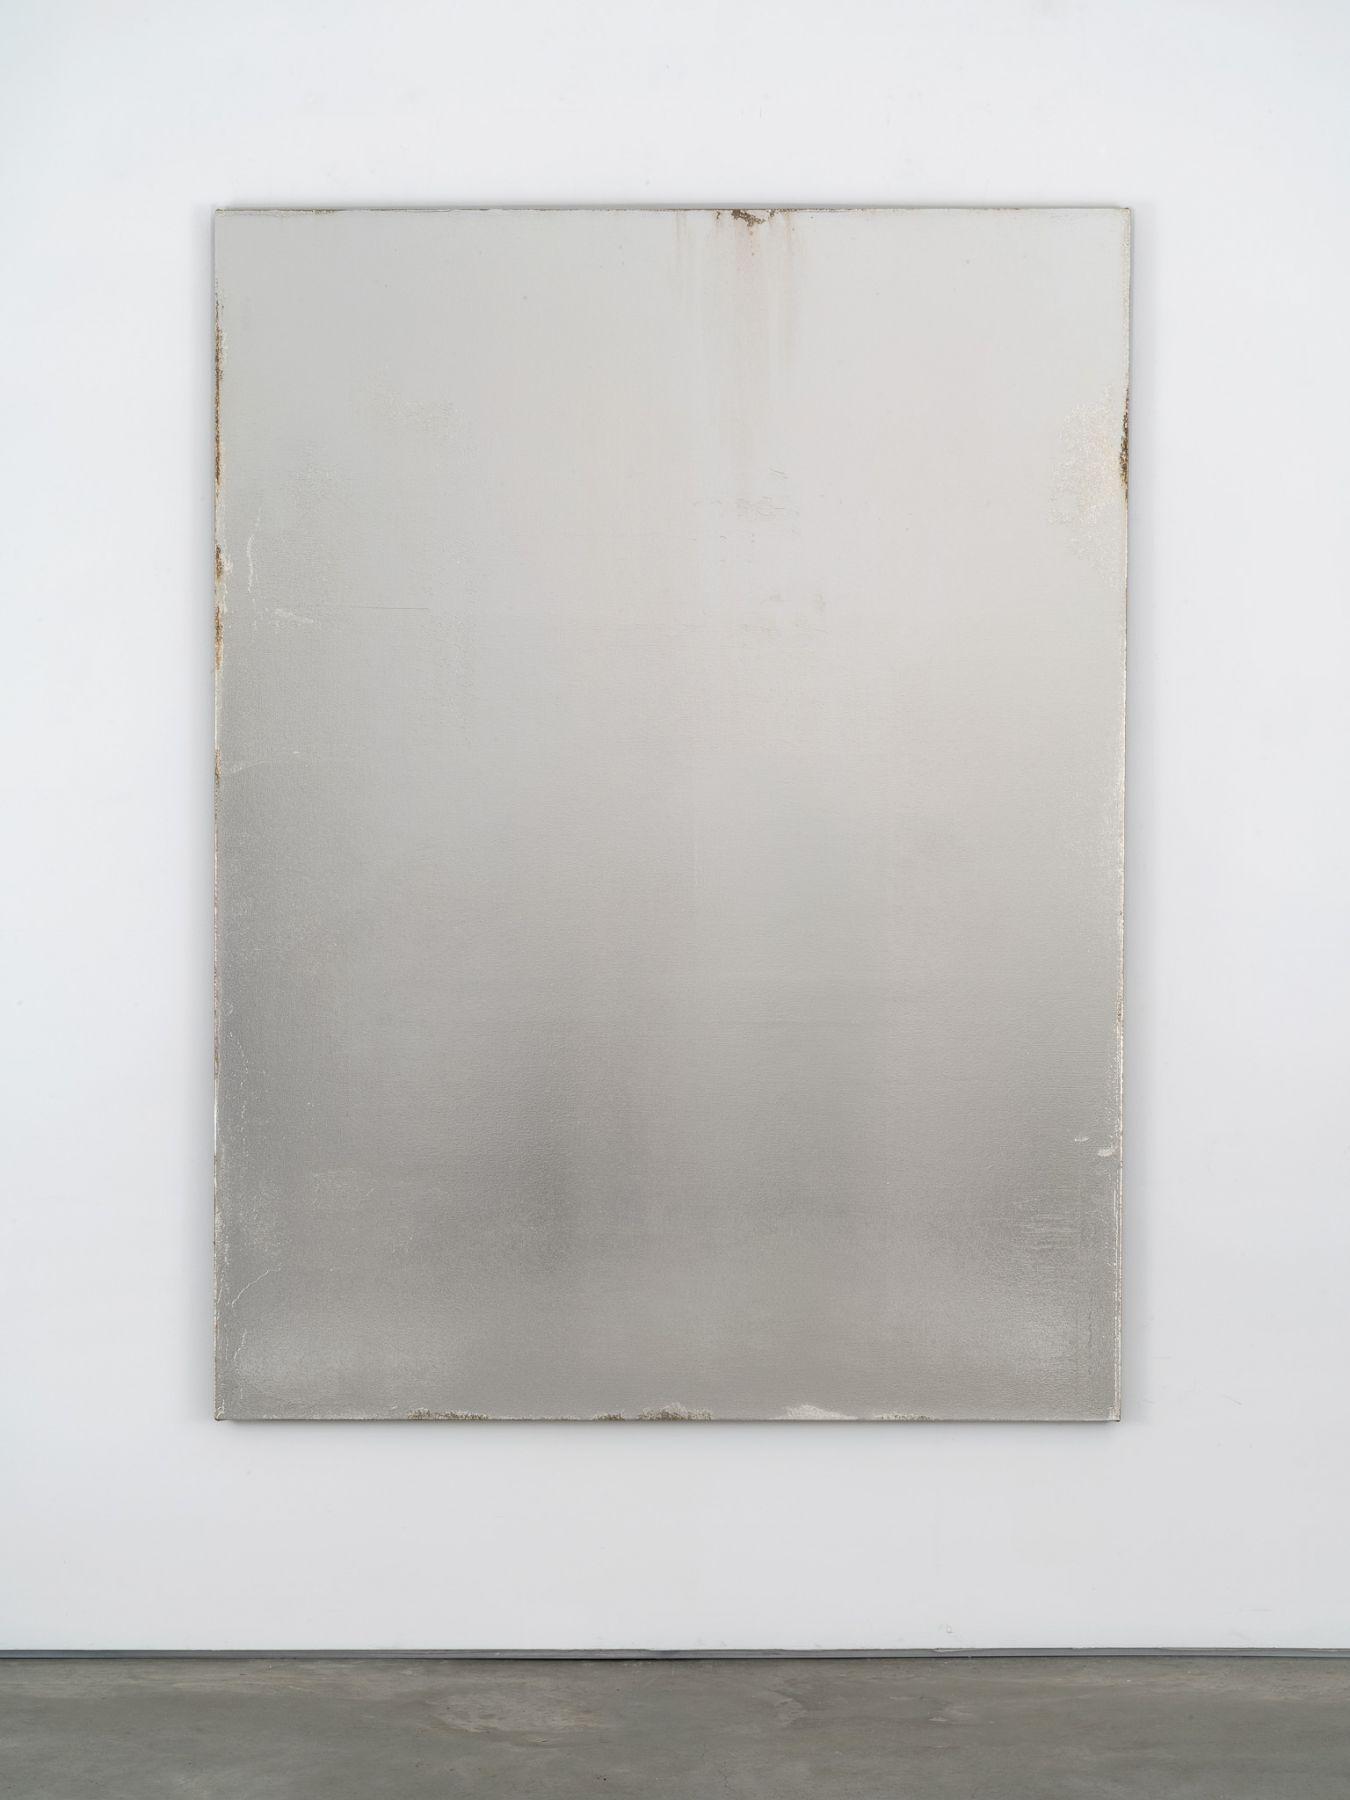 Jacob Kassay, Untitled, 2018